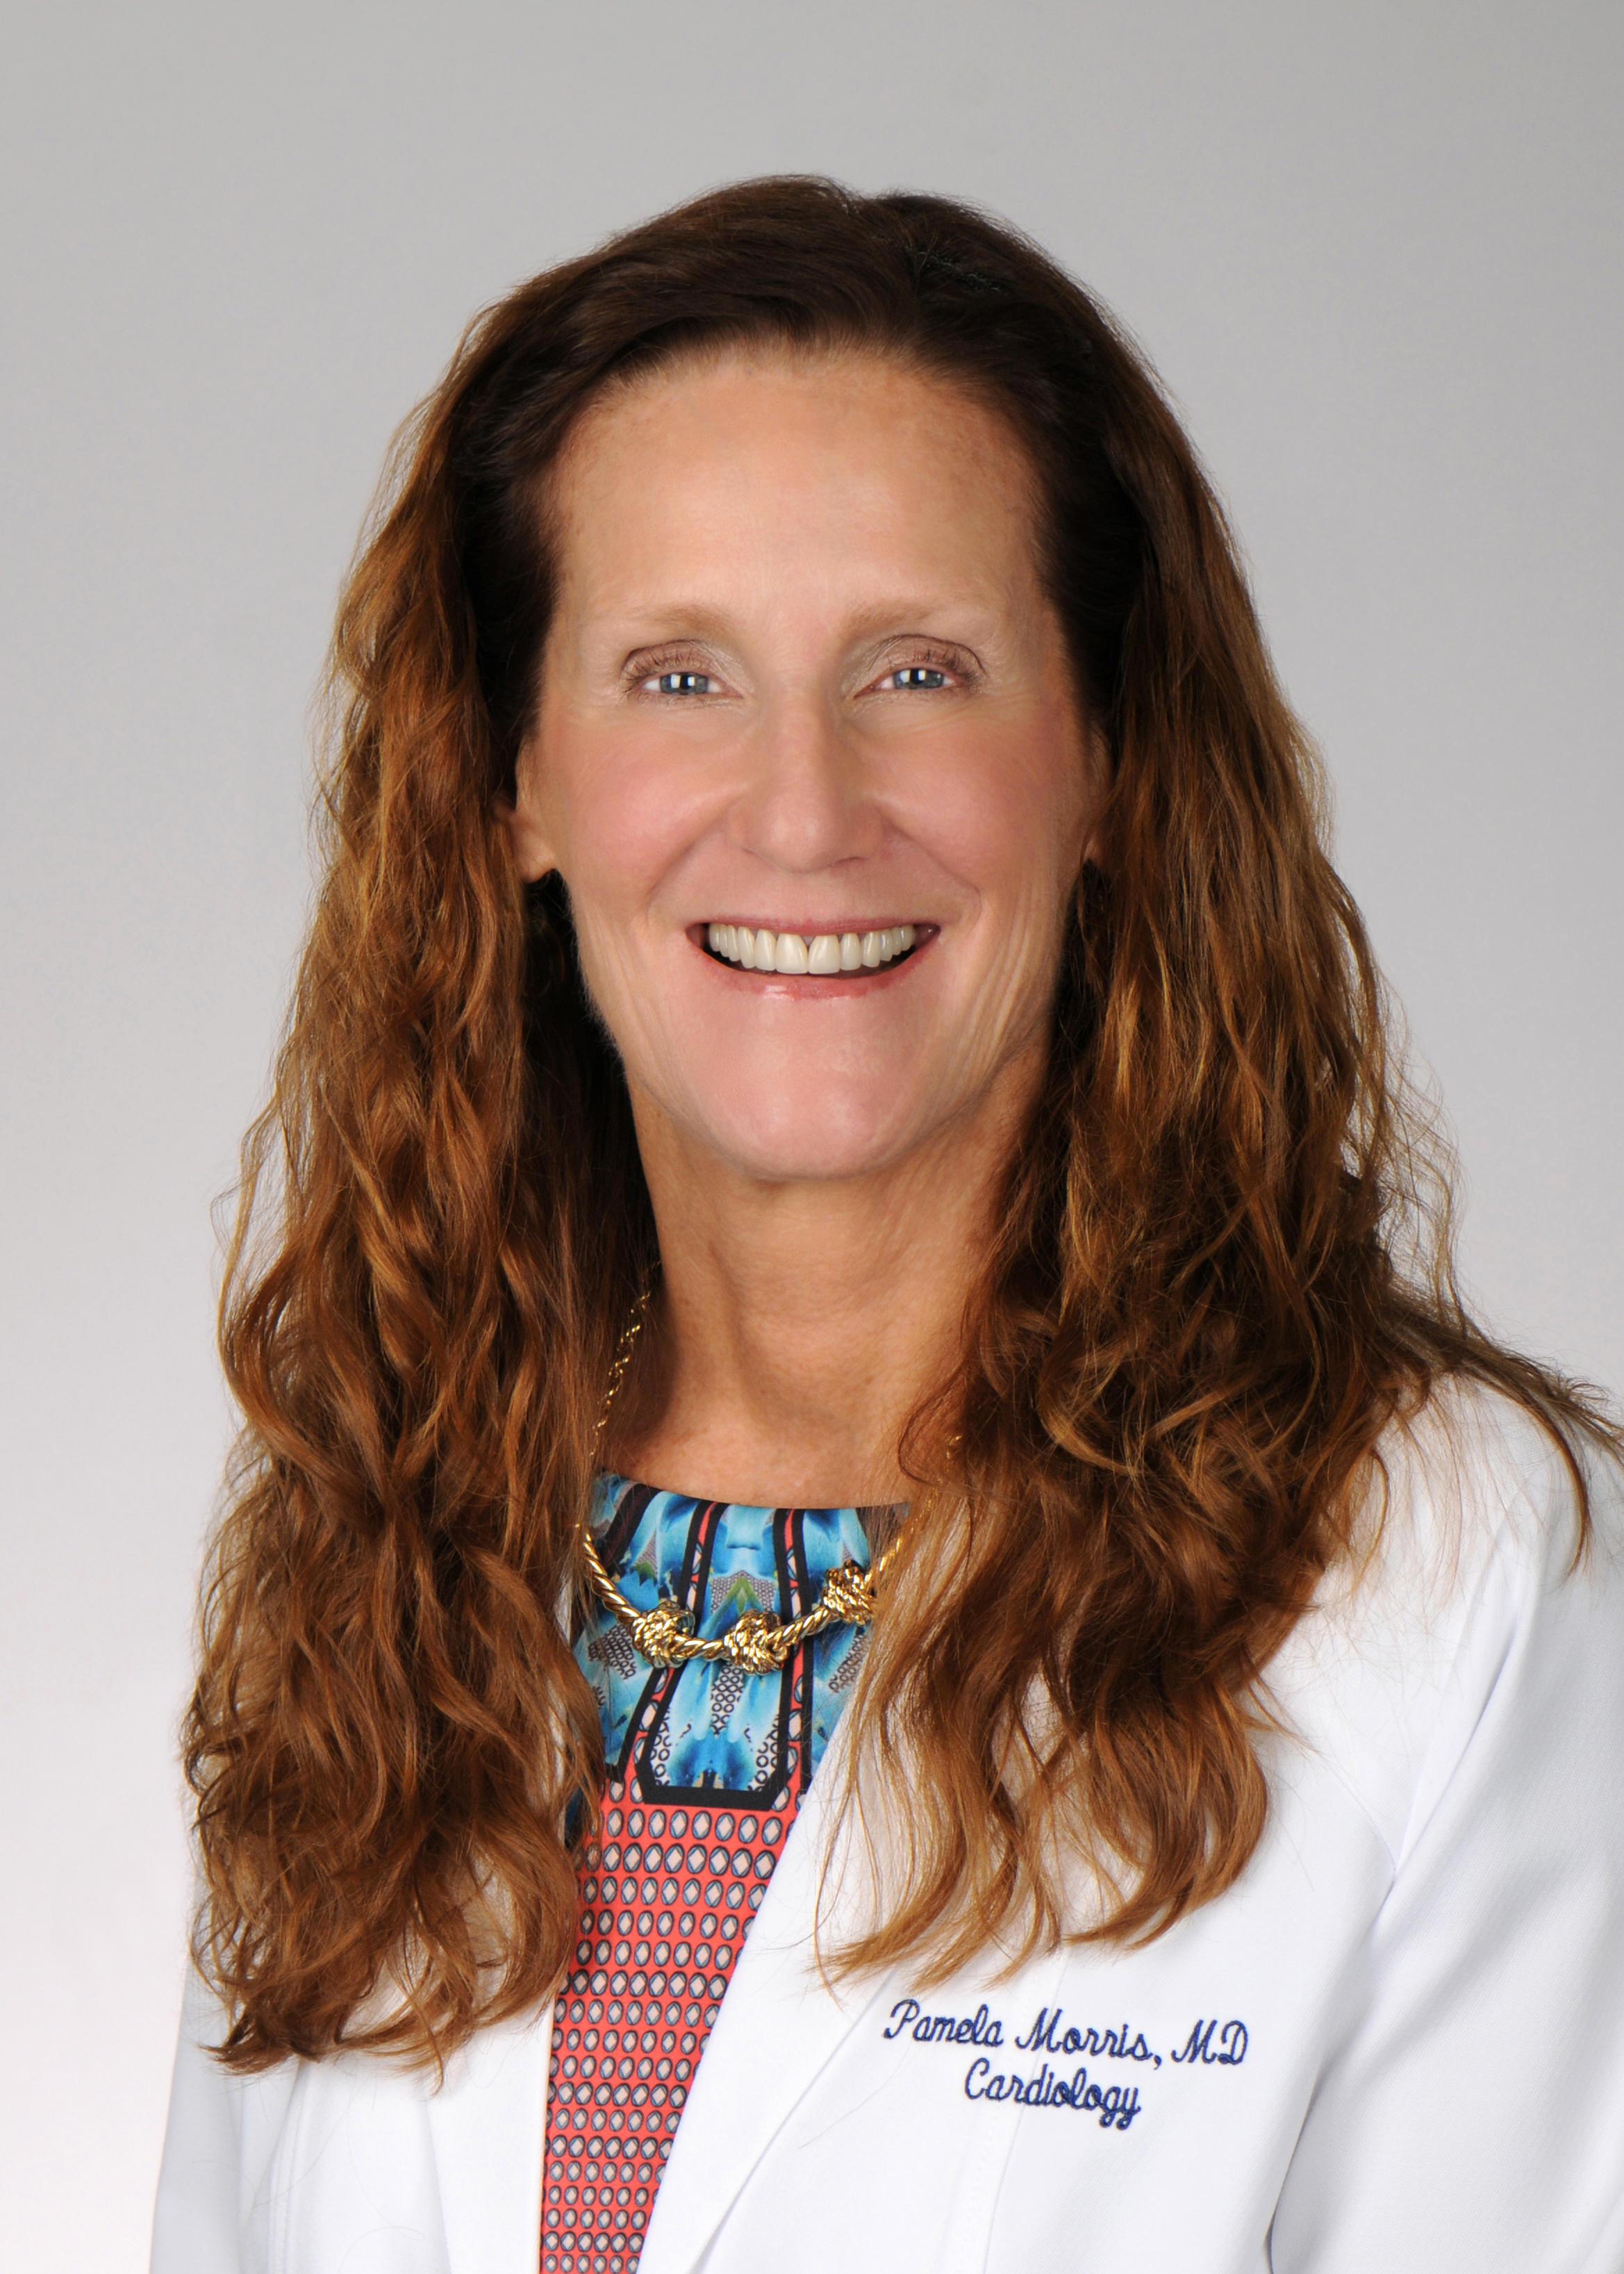 Pamela Bowe Morris, MD image 1